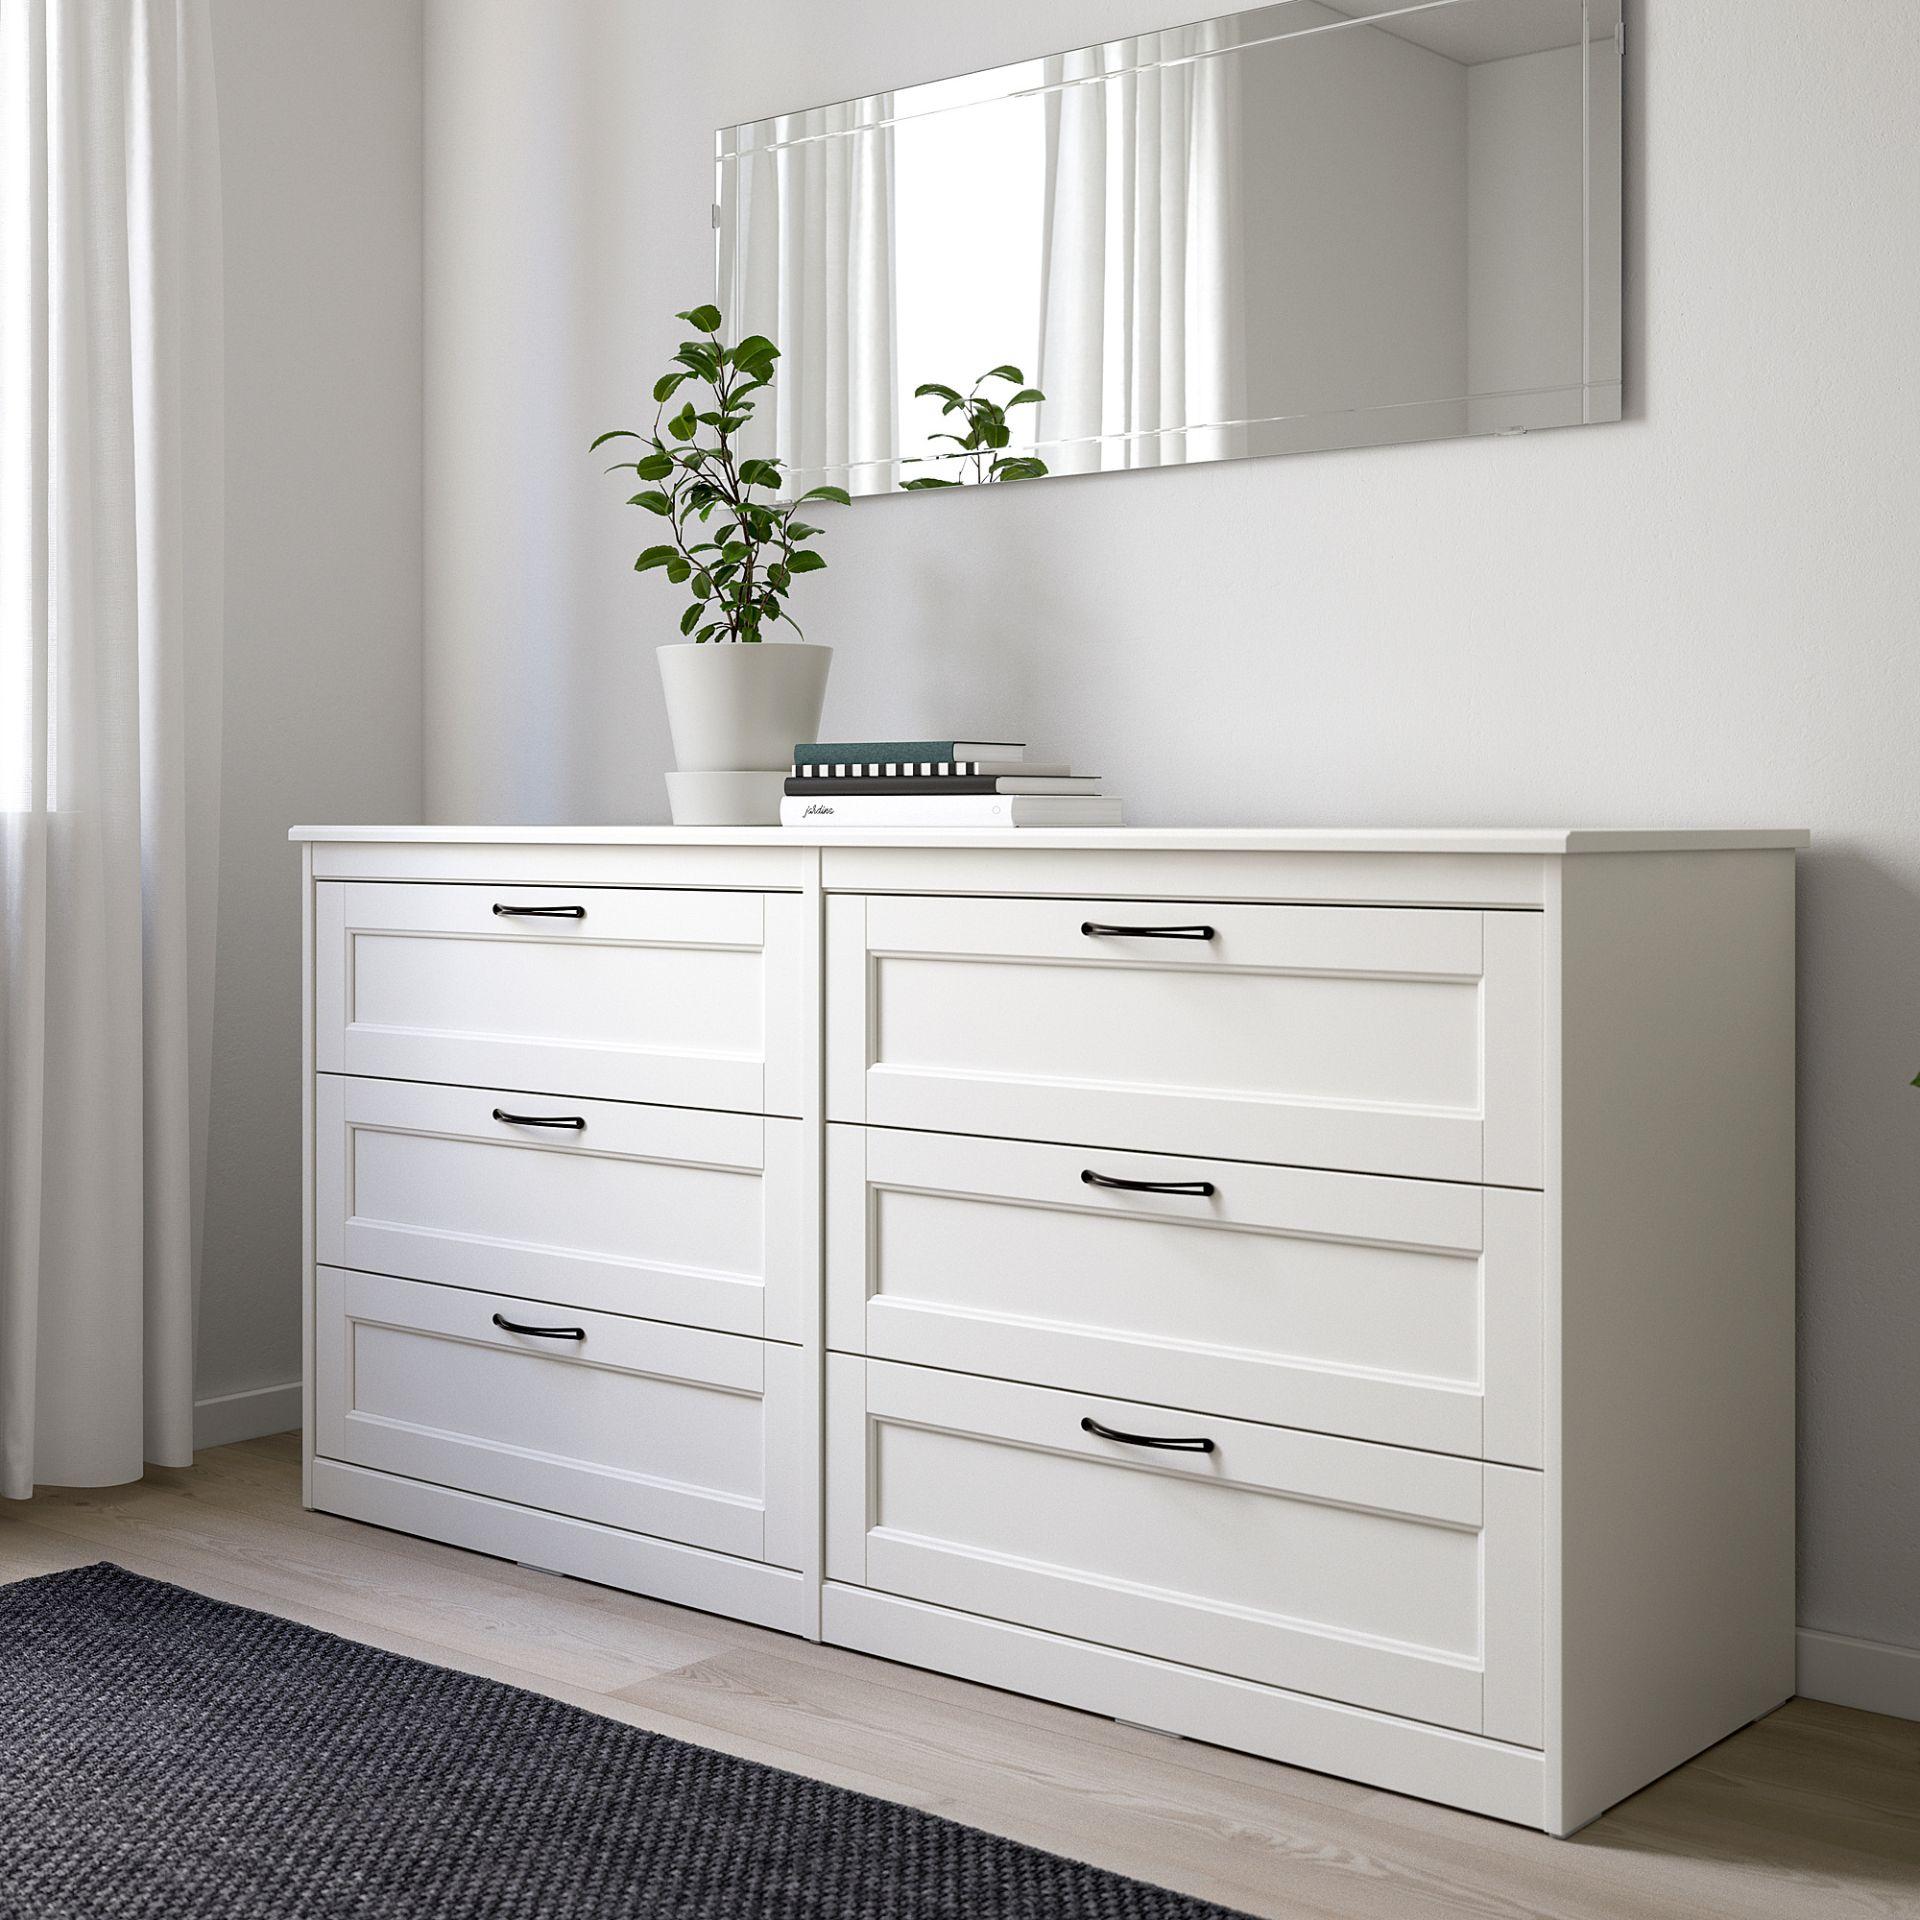 Assembling dressers IKEA